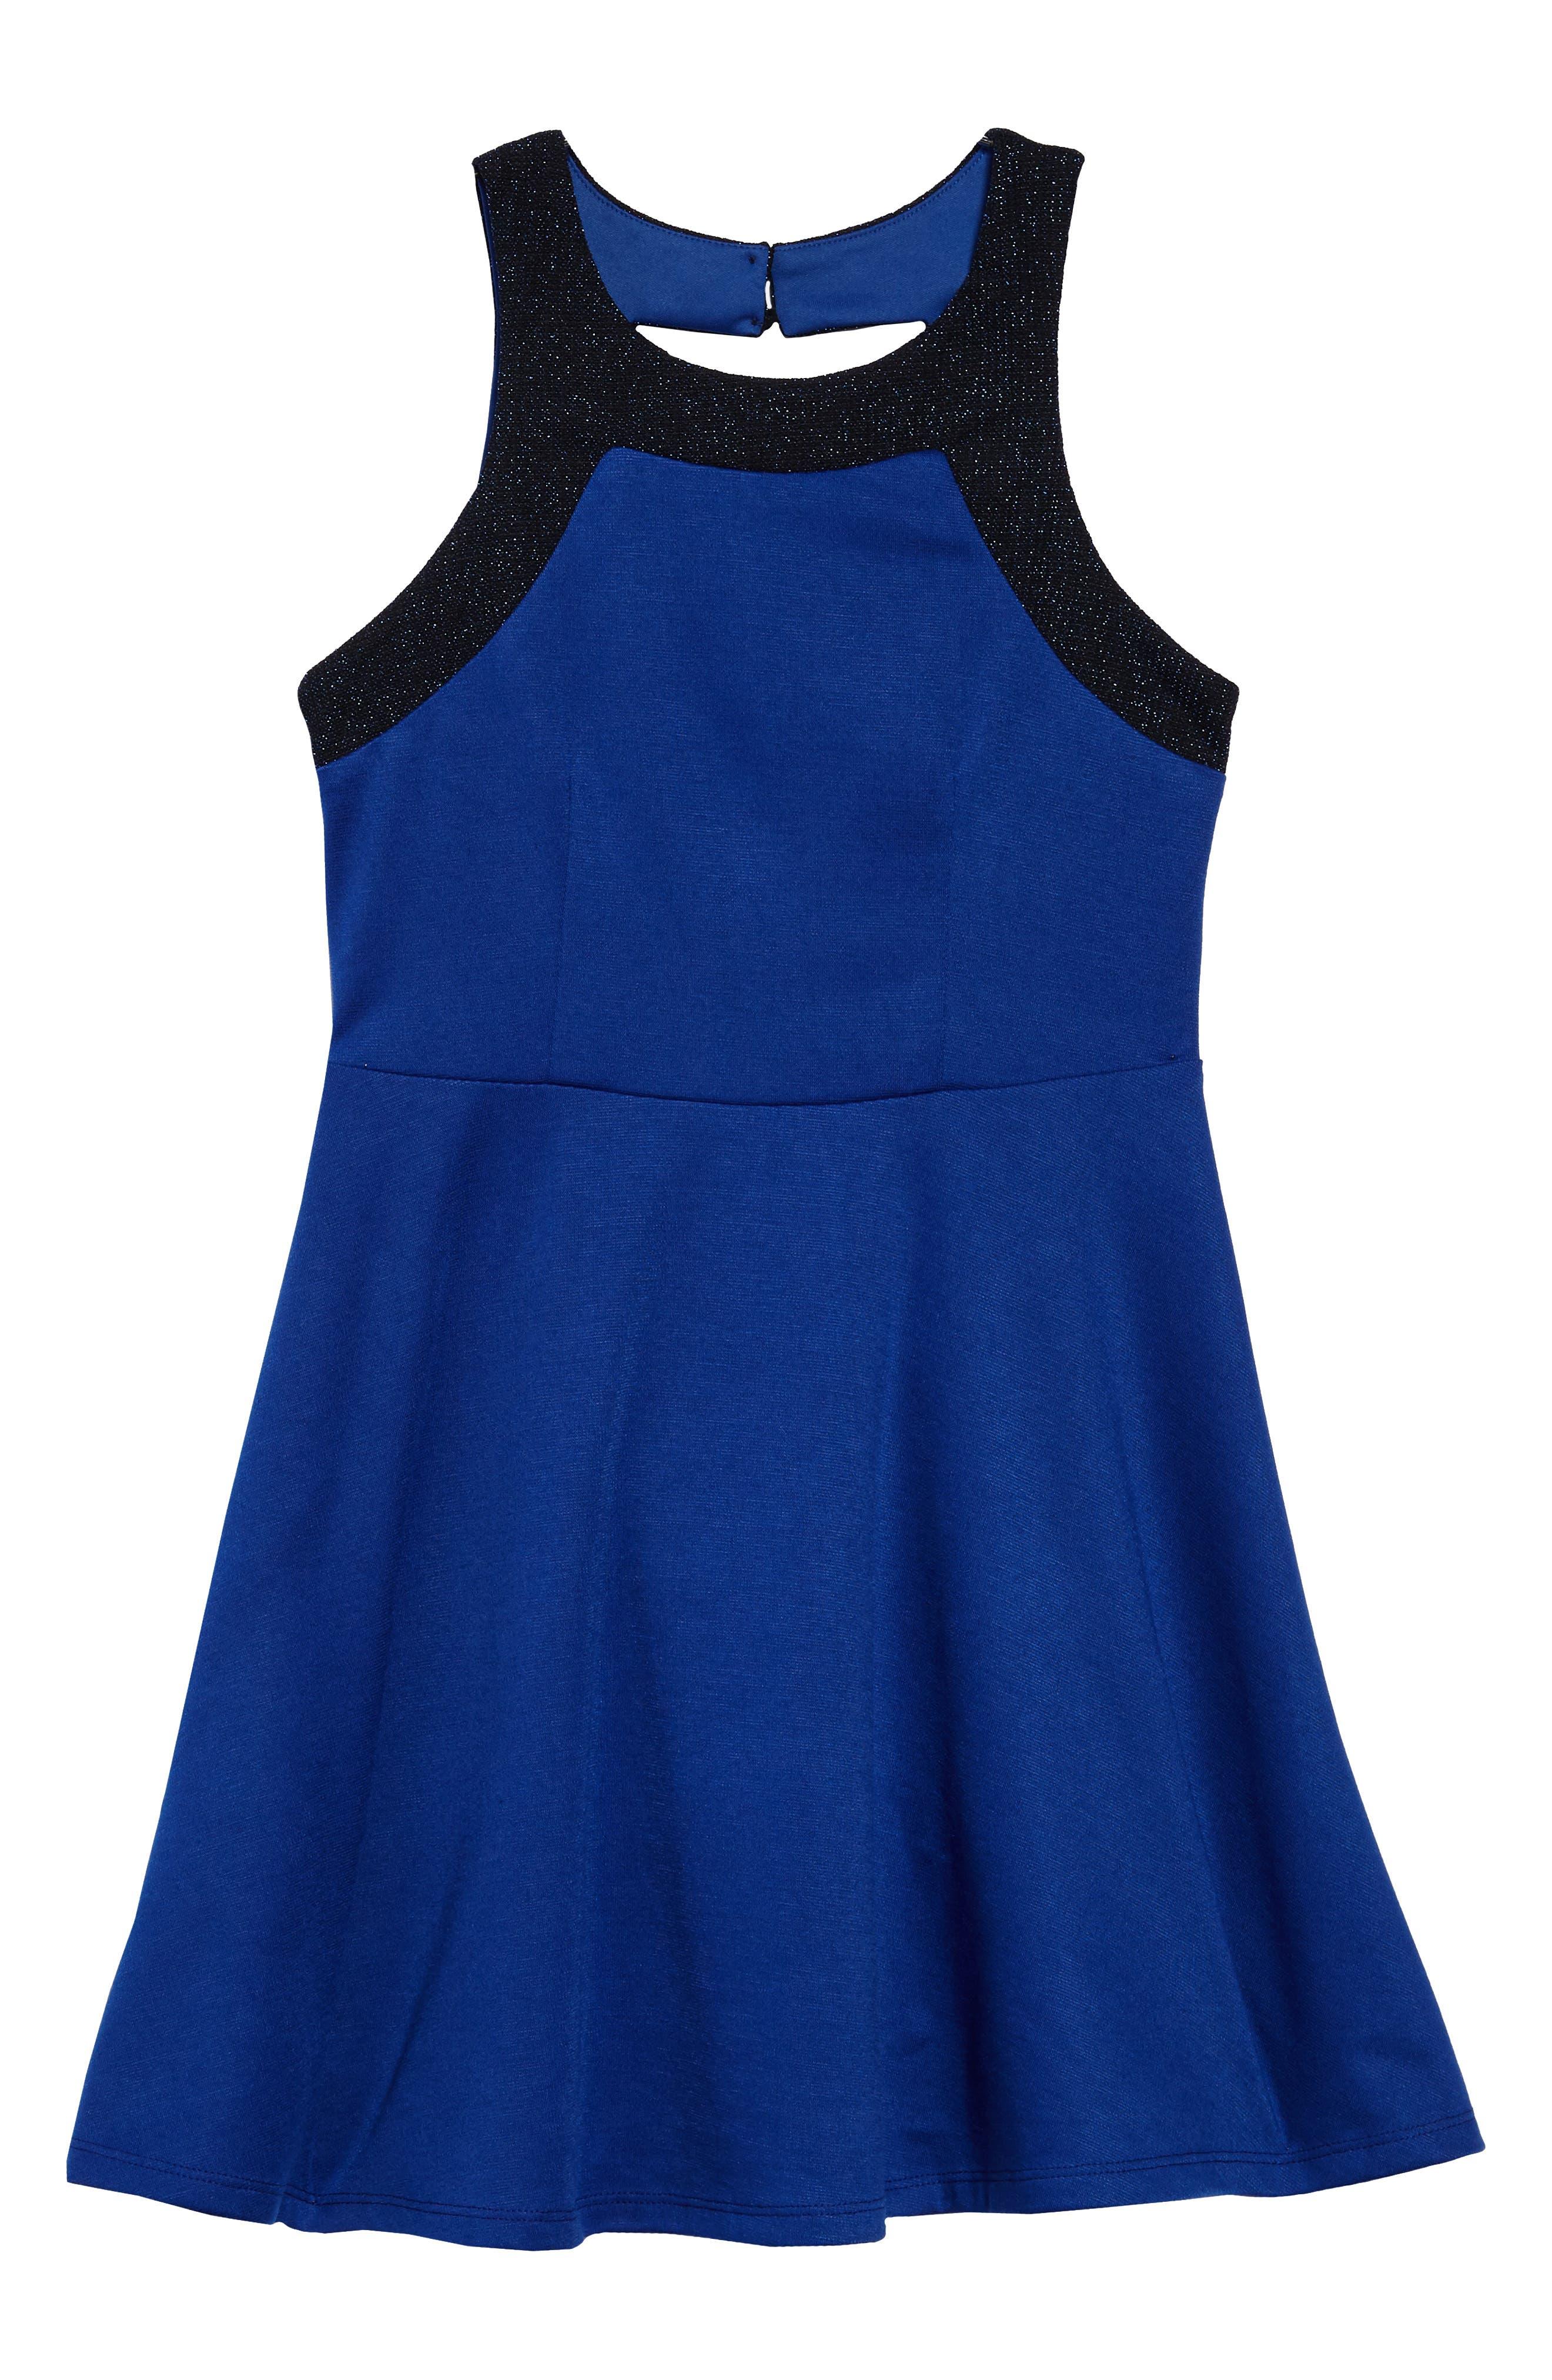 Heather Open Back Dress,                         Main,                         color, 420